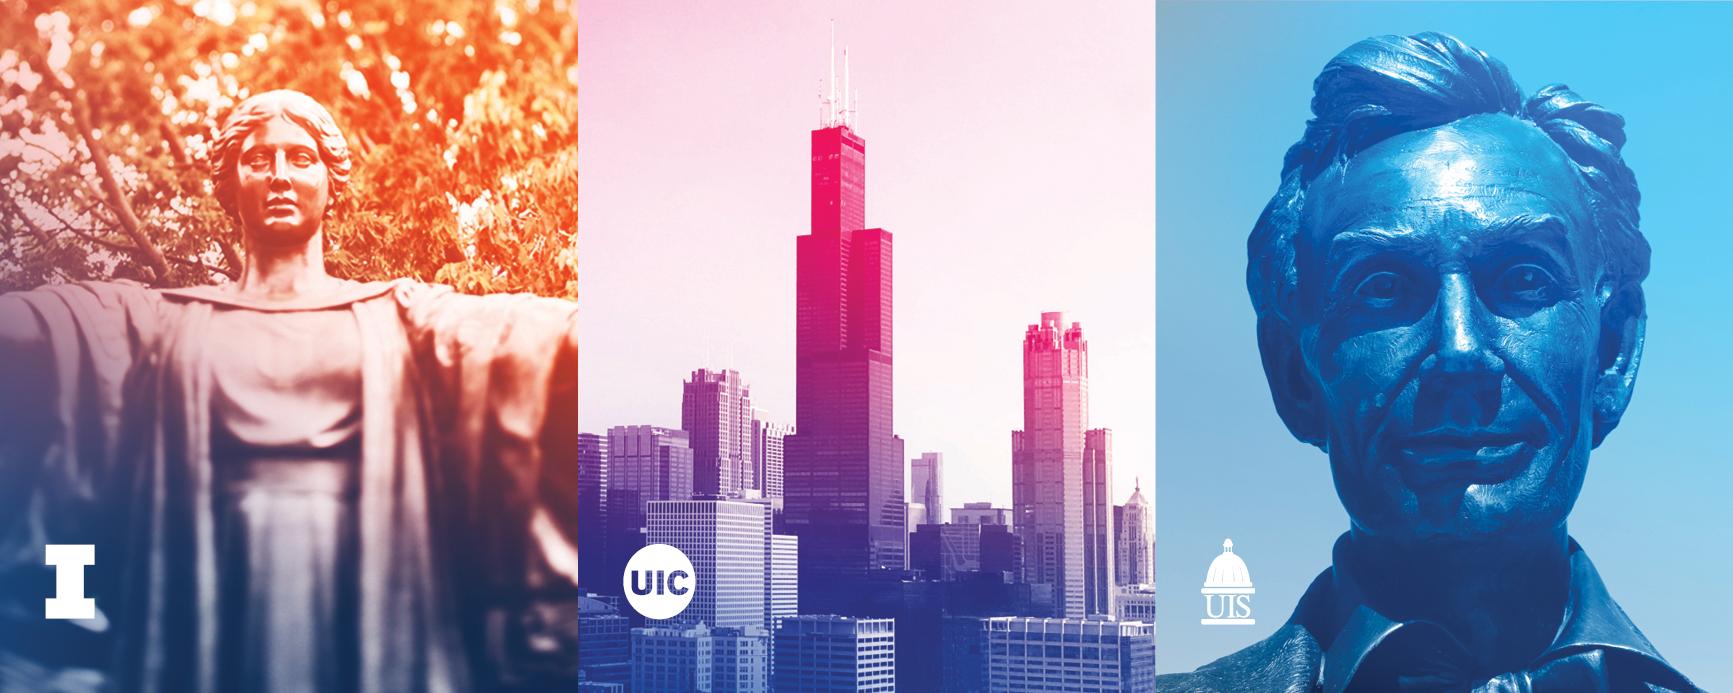 Alma Mater, Chicago Skyline, Lincoln bust - university logos